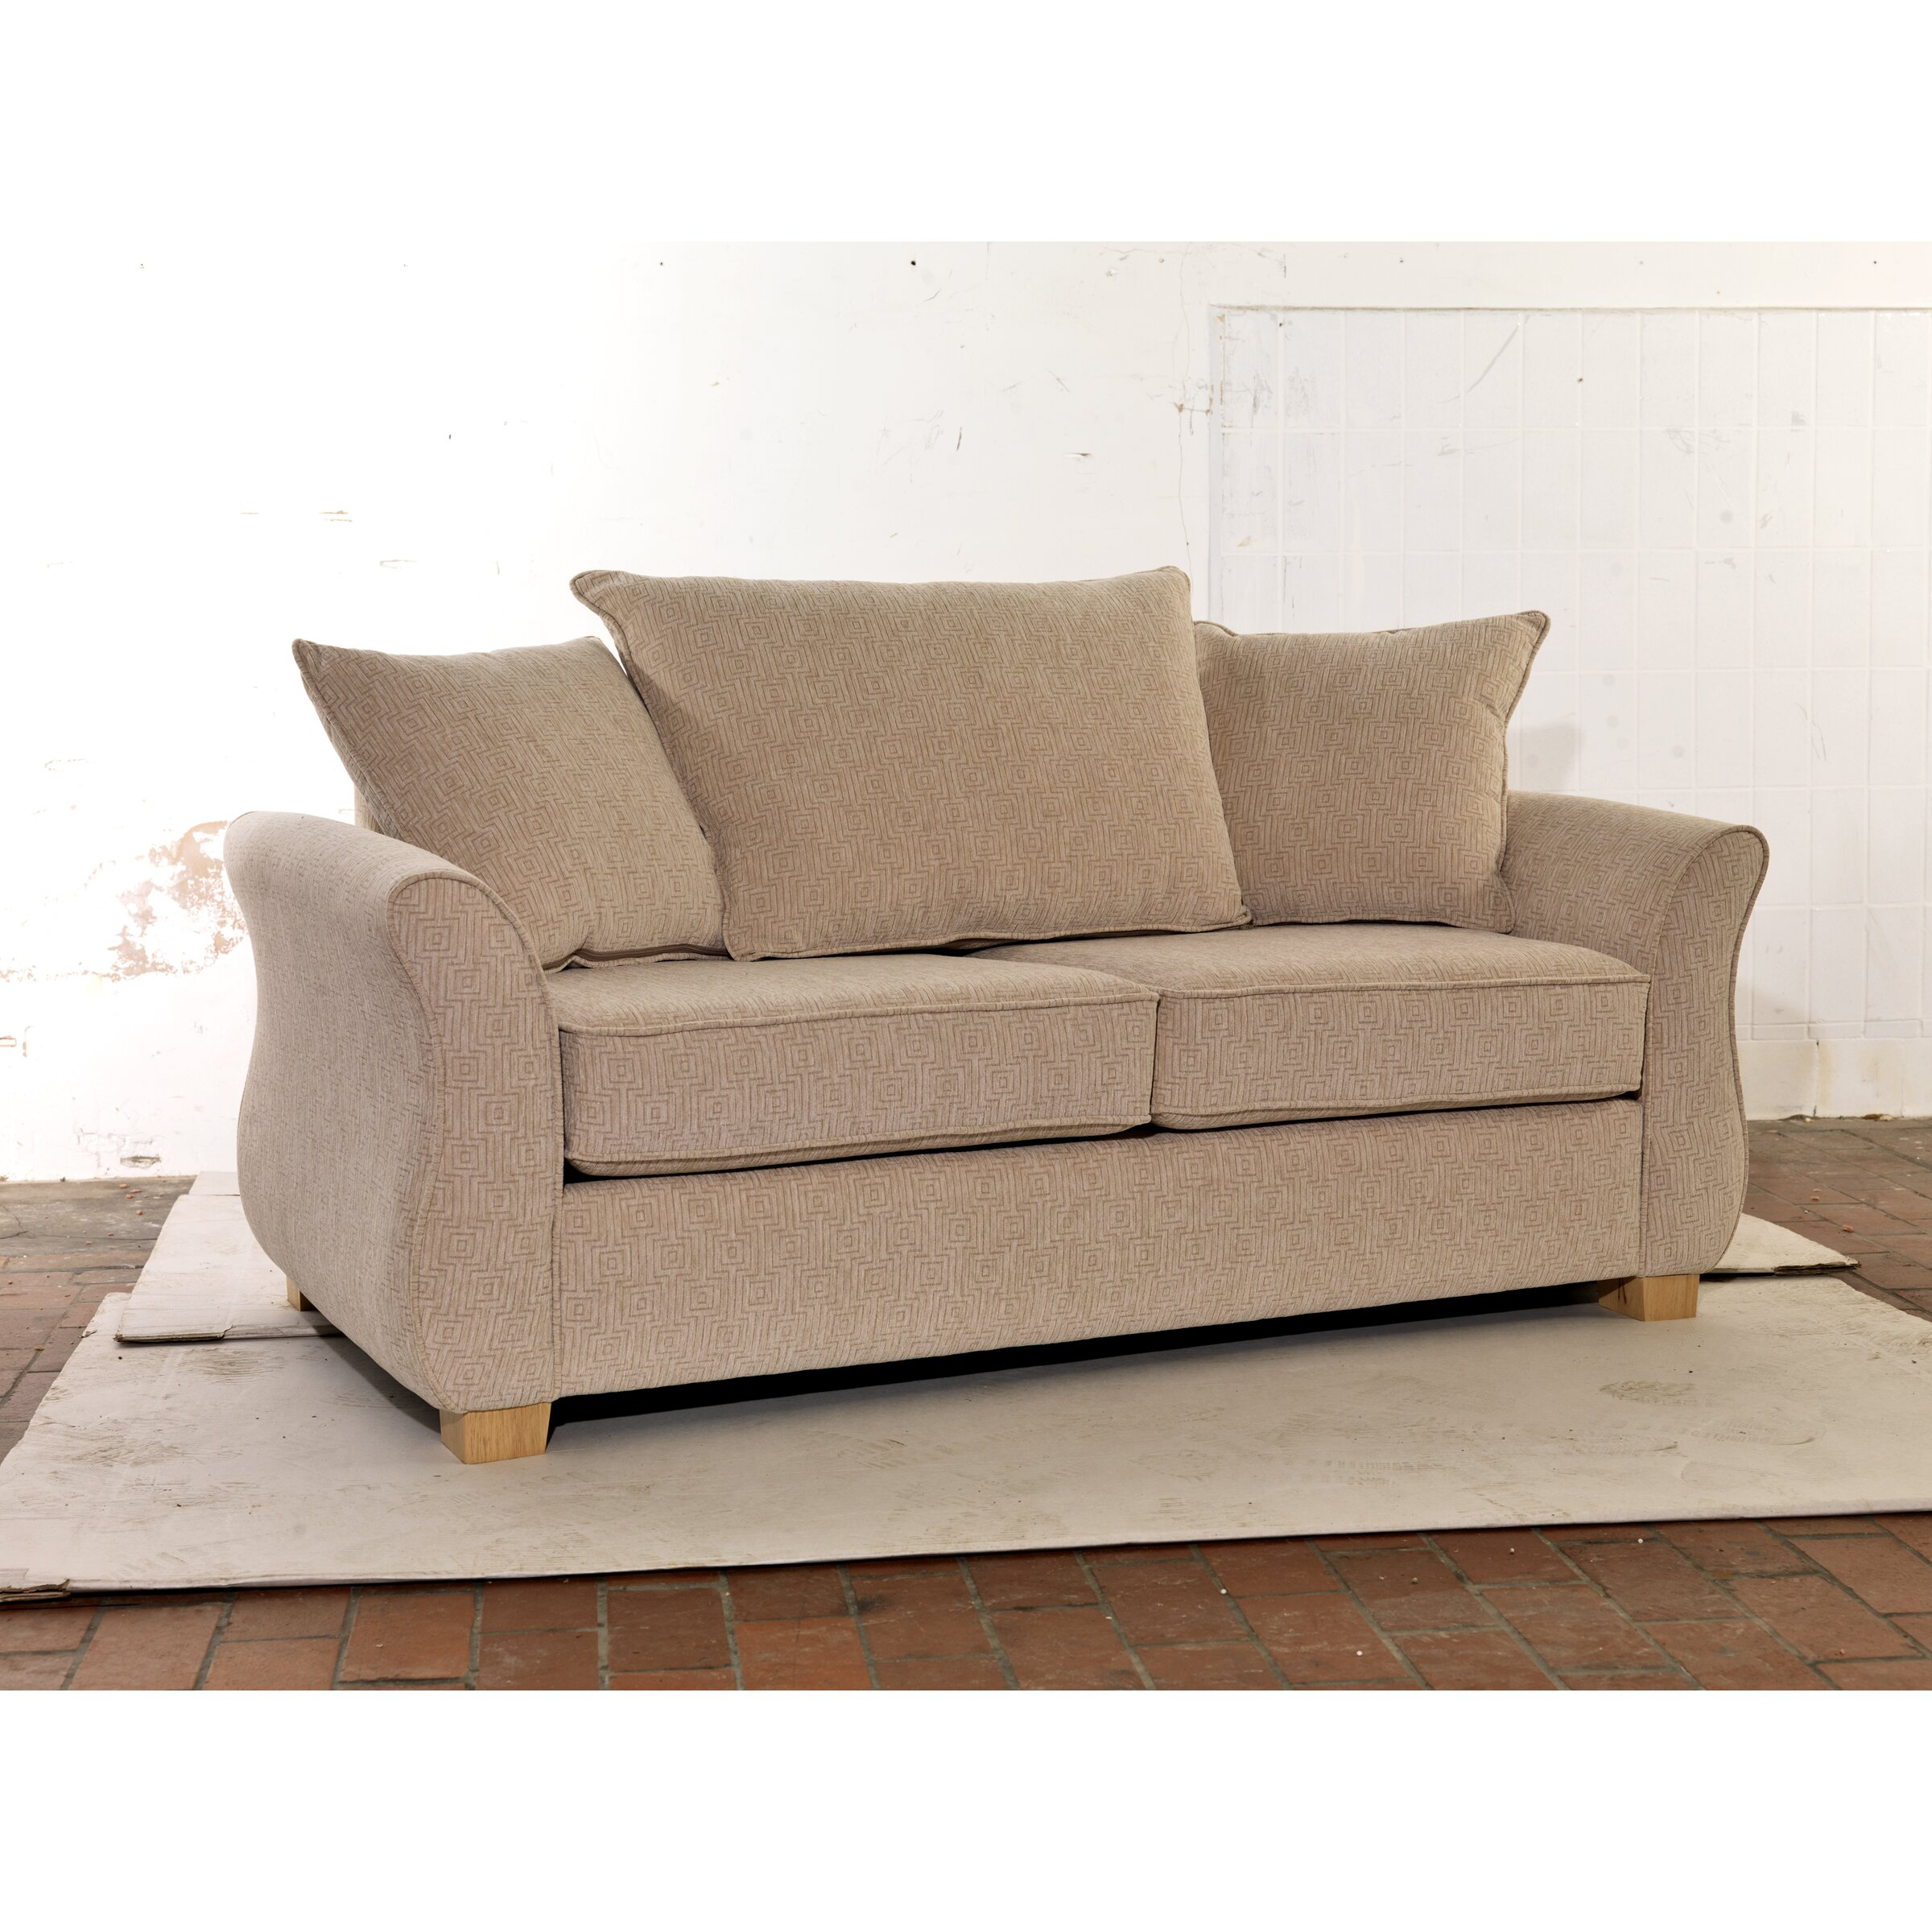 uk icon design regal 2 seater fold out sofa wayfair uk. Black Bedroom Furniture Sets. Home Design Ideas